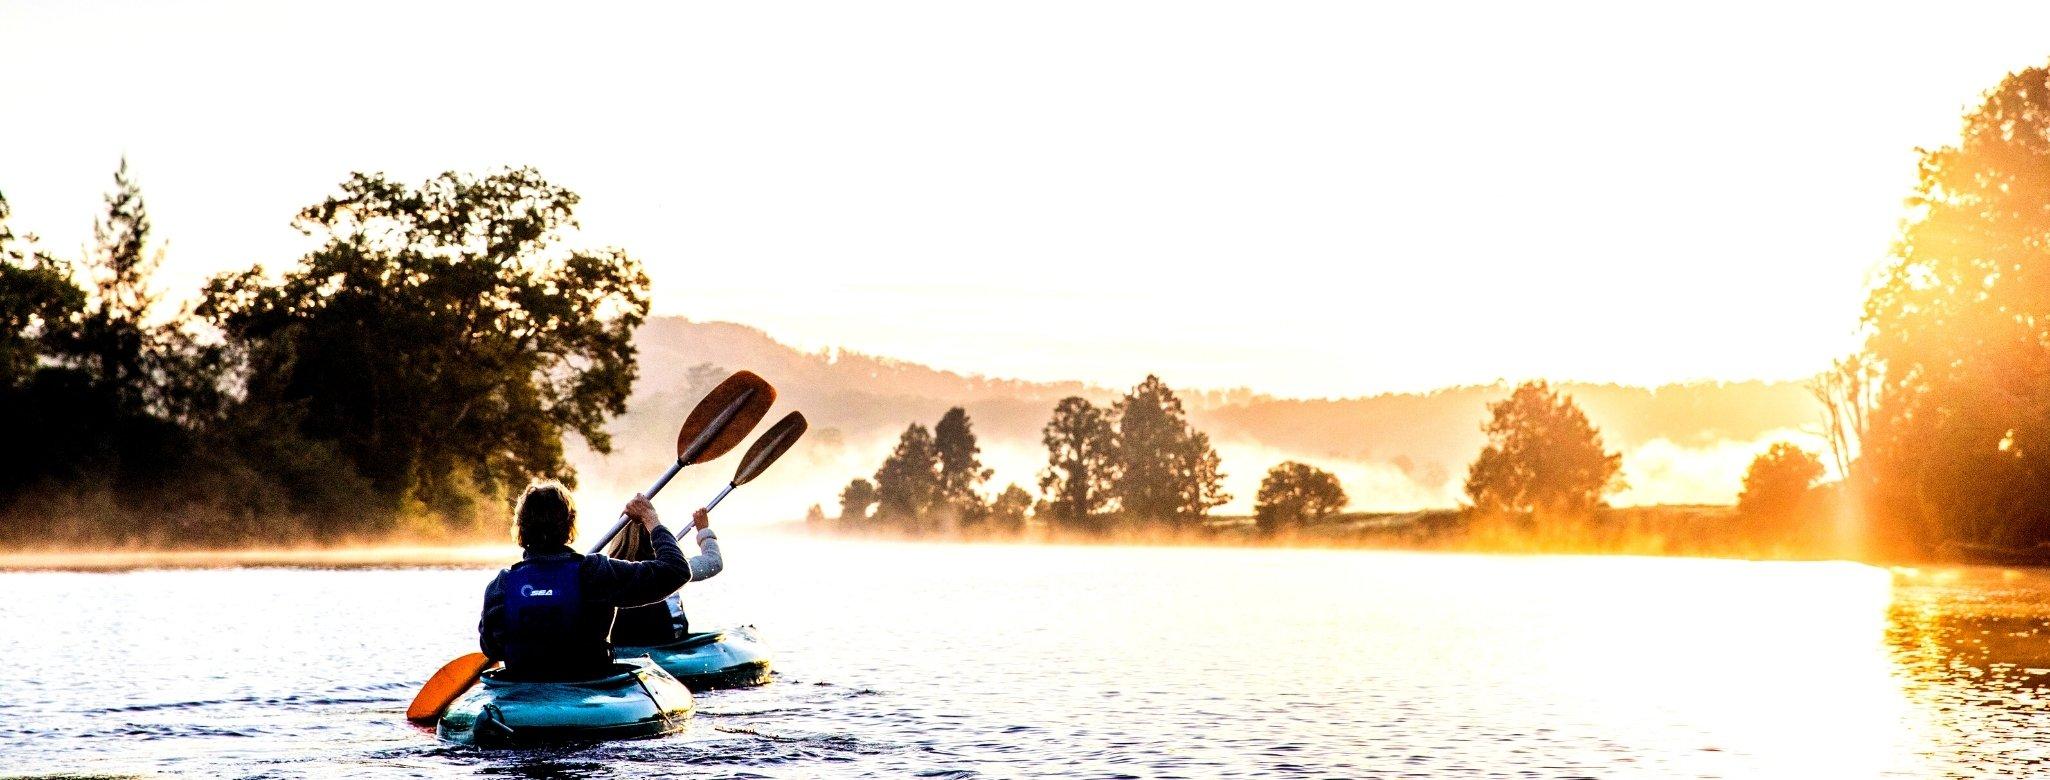 Bellingen Canoe Adventures, New South Wales